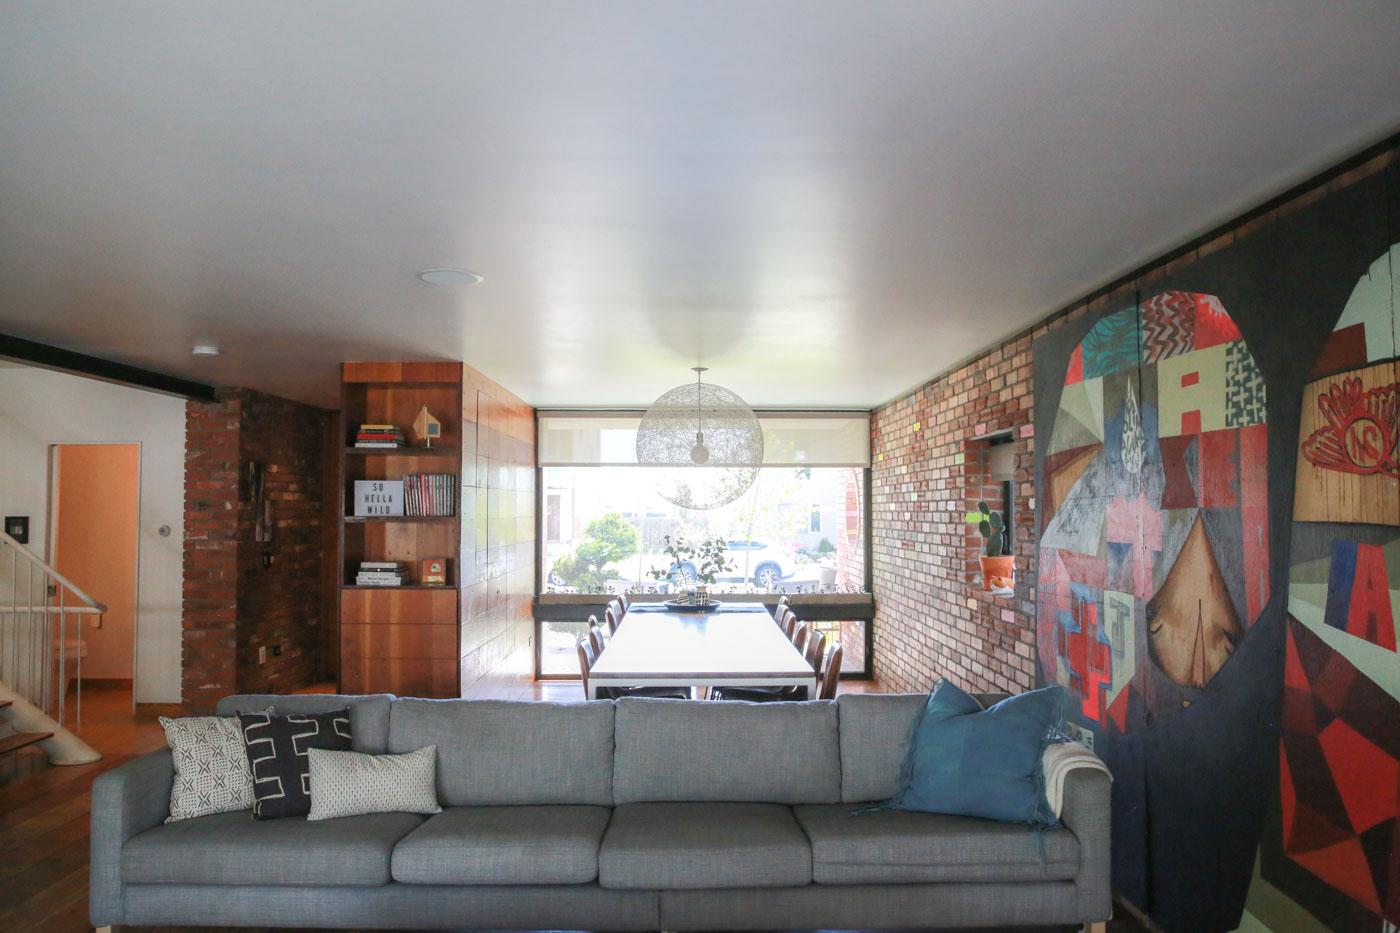 HellaCreative-DenverCO-natural-light-photography-studio-lifestyle-photoshoot-location-editorial-commercial-photography-3.jpg